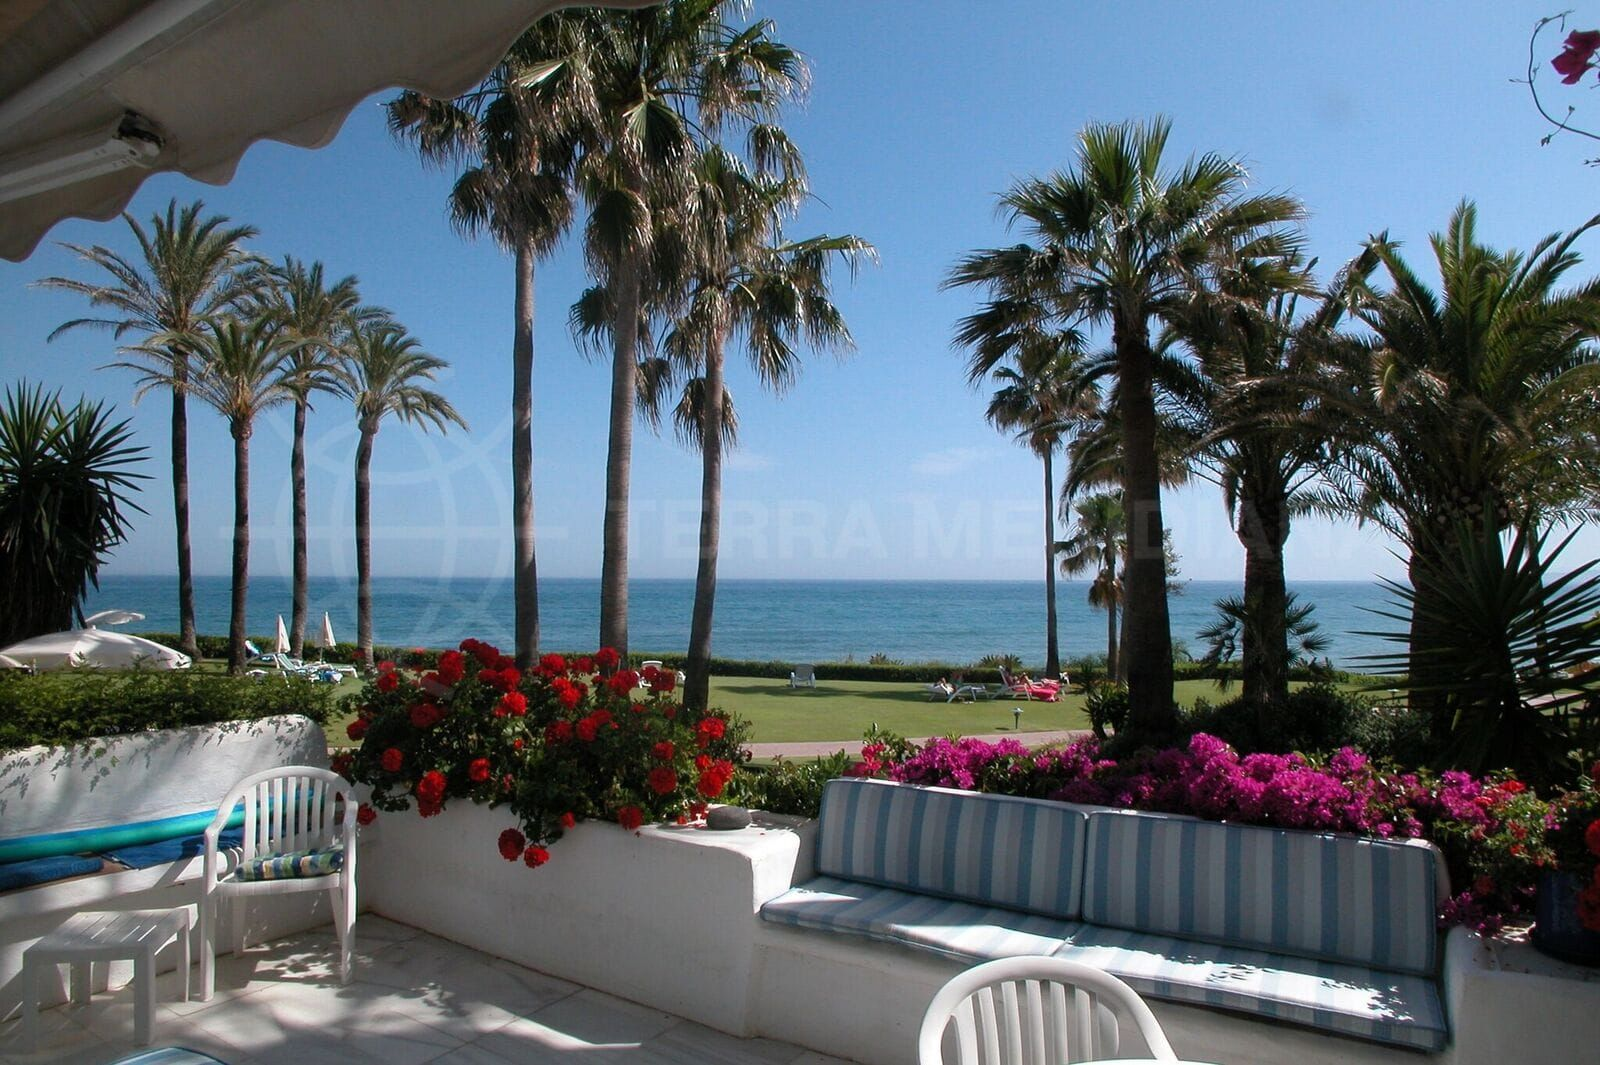 Guide de Alcazaba Beach | Vivre à l'Alcazaba Beach